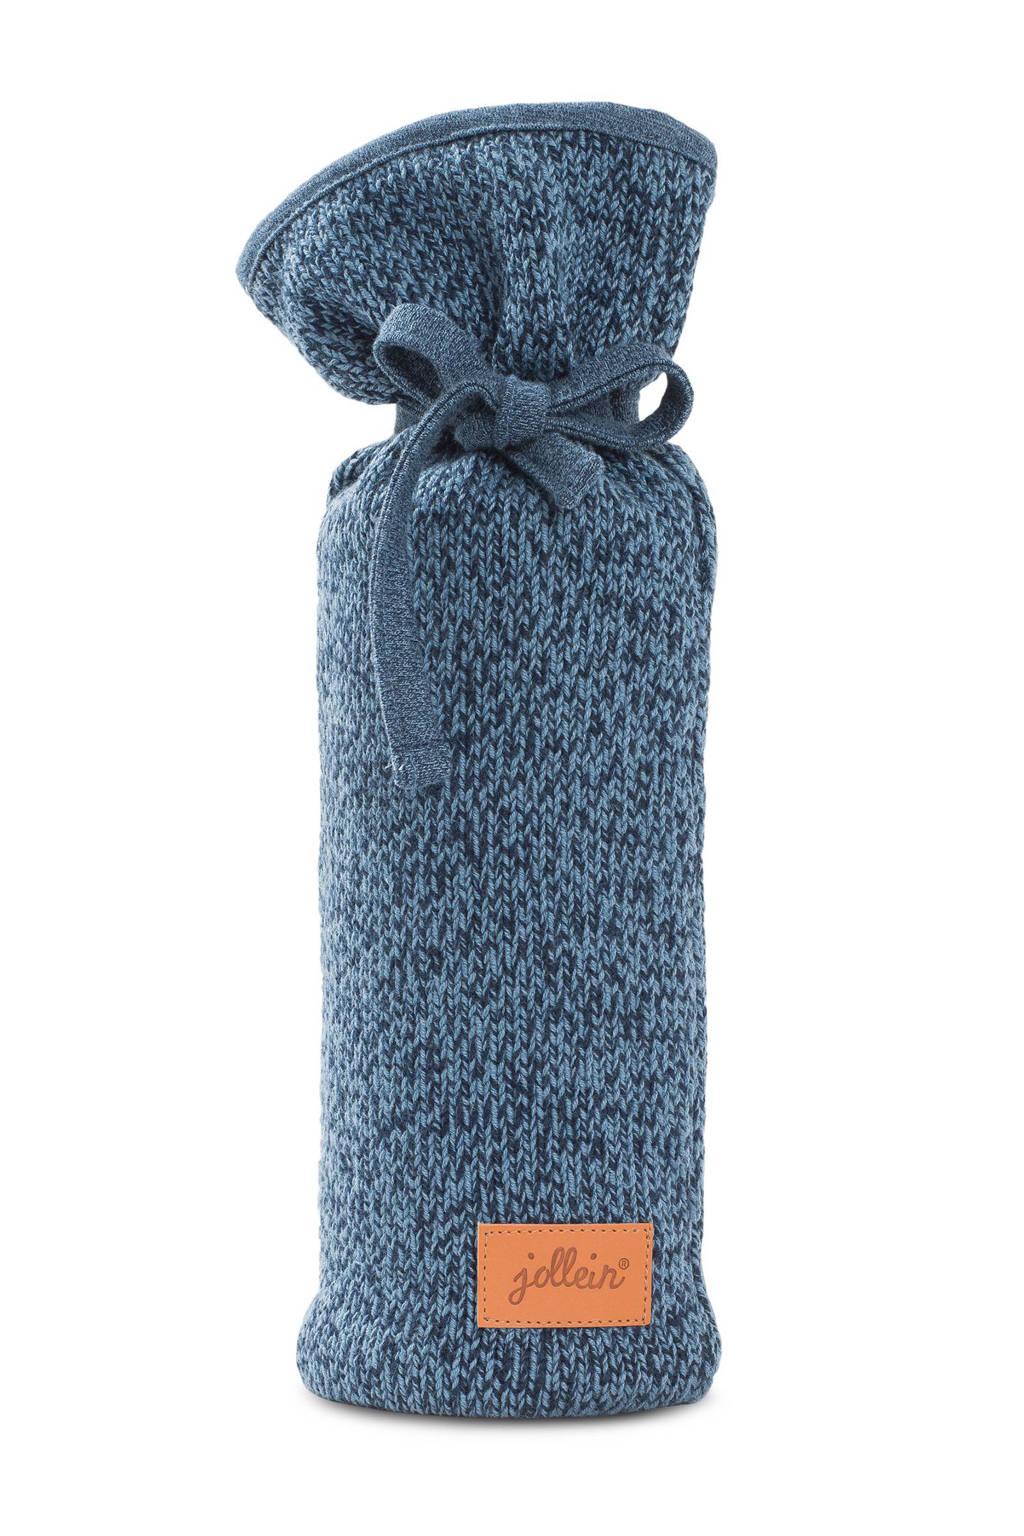 Jollein stonewashed knit kruikenzak marine, Marine